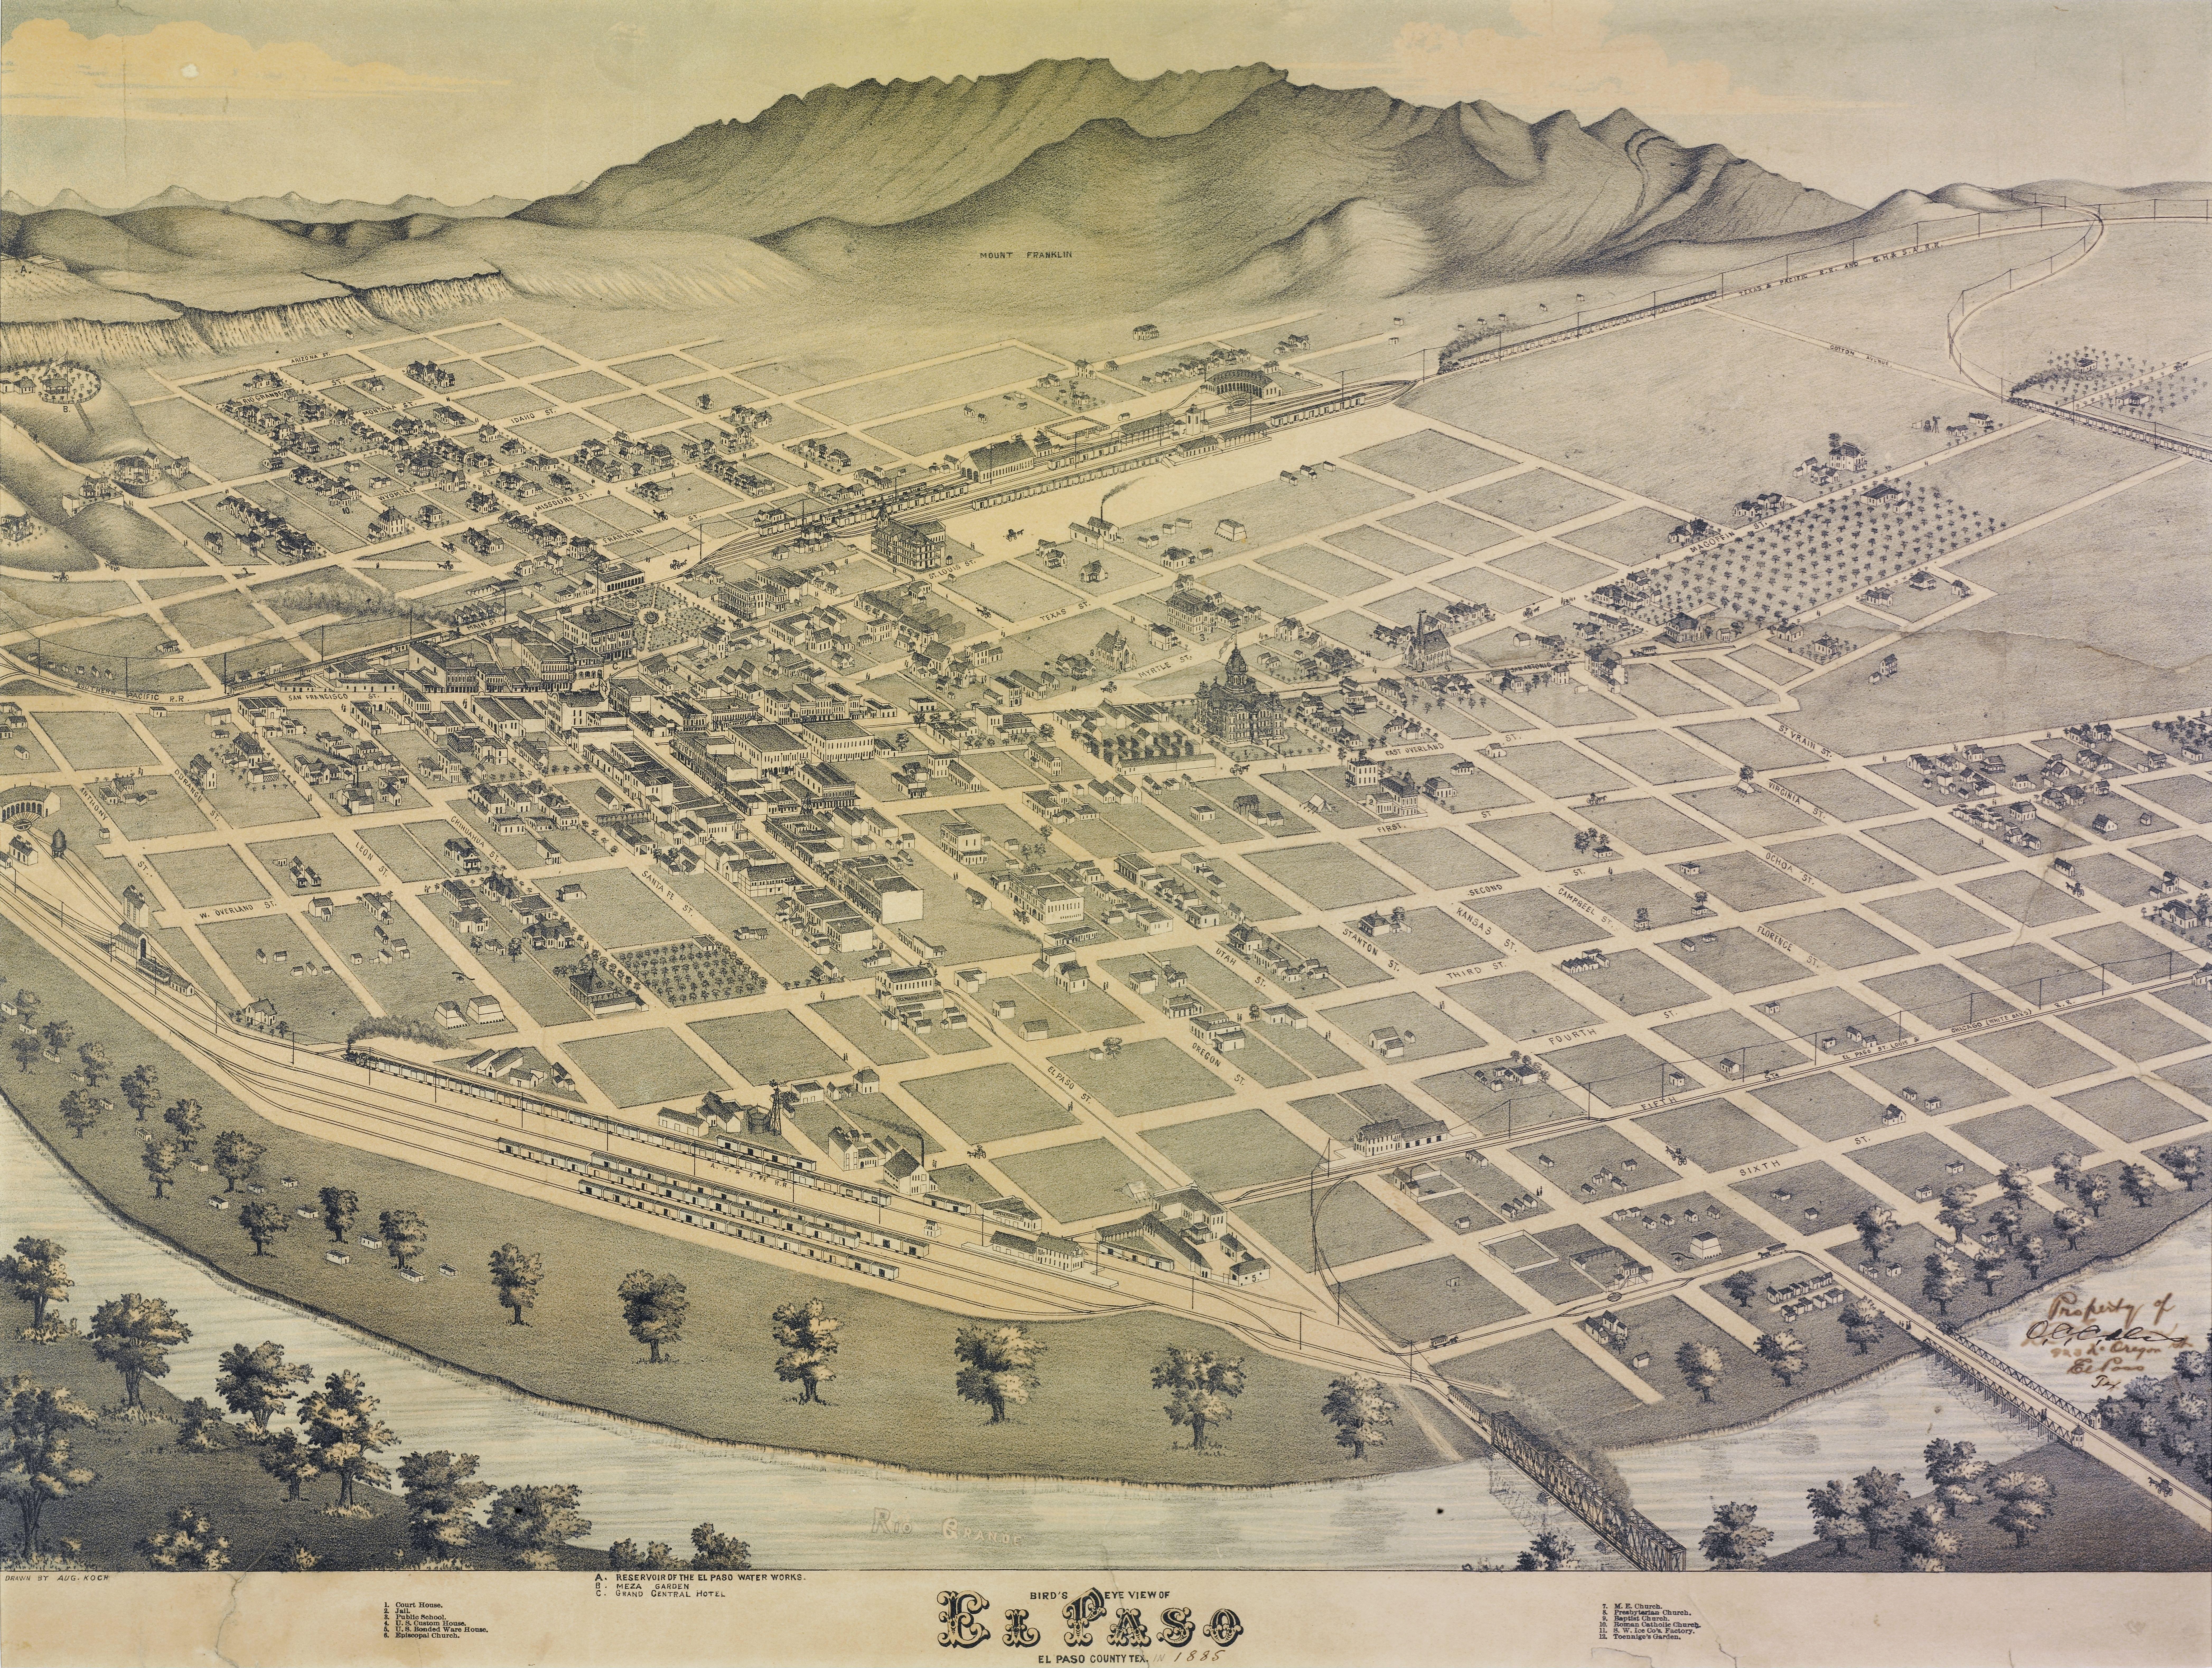 https://image.ibb.co/i6GQDp/map_Old_map_El_Paso_1886.jpg